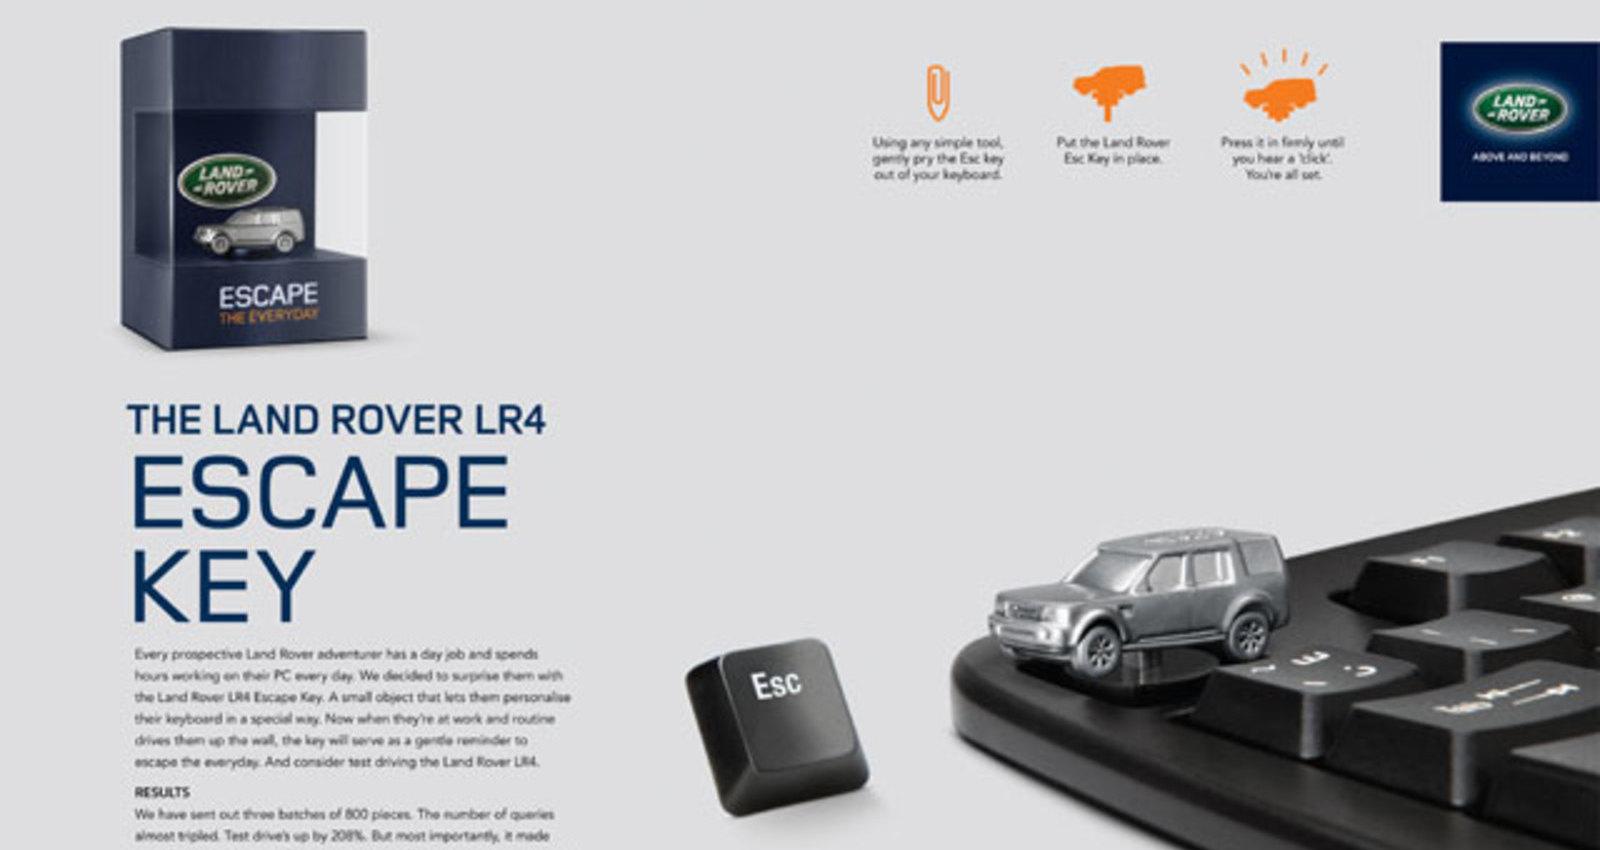 The Land Rover Escape Key